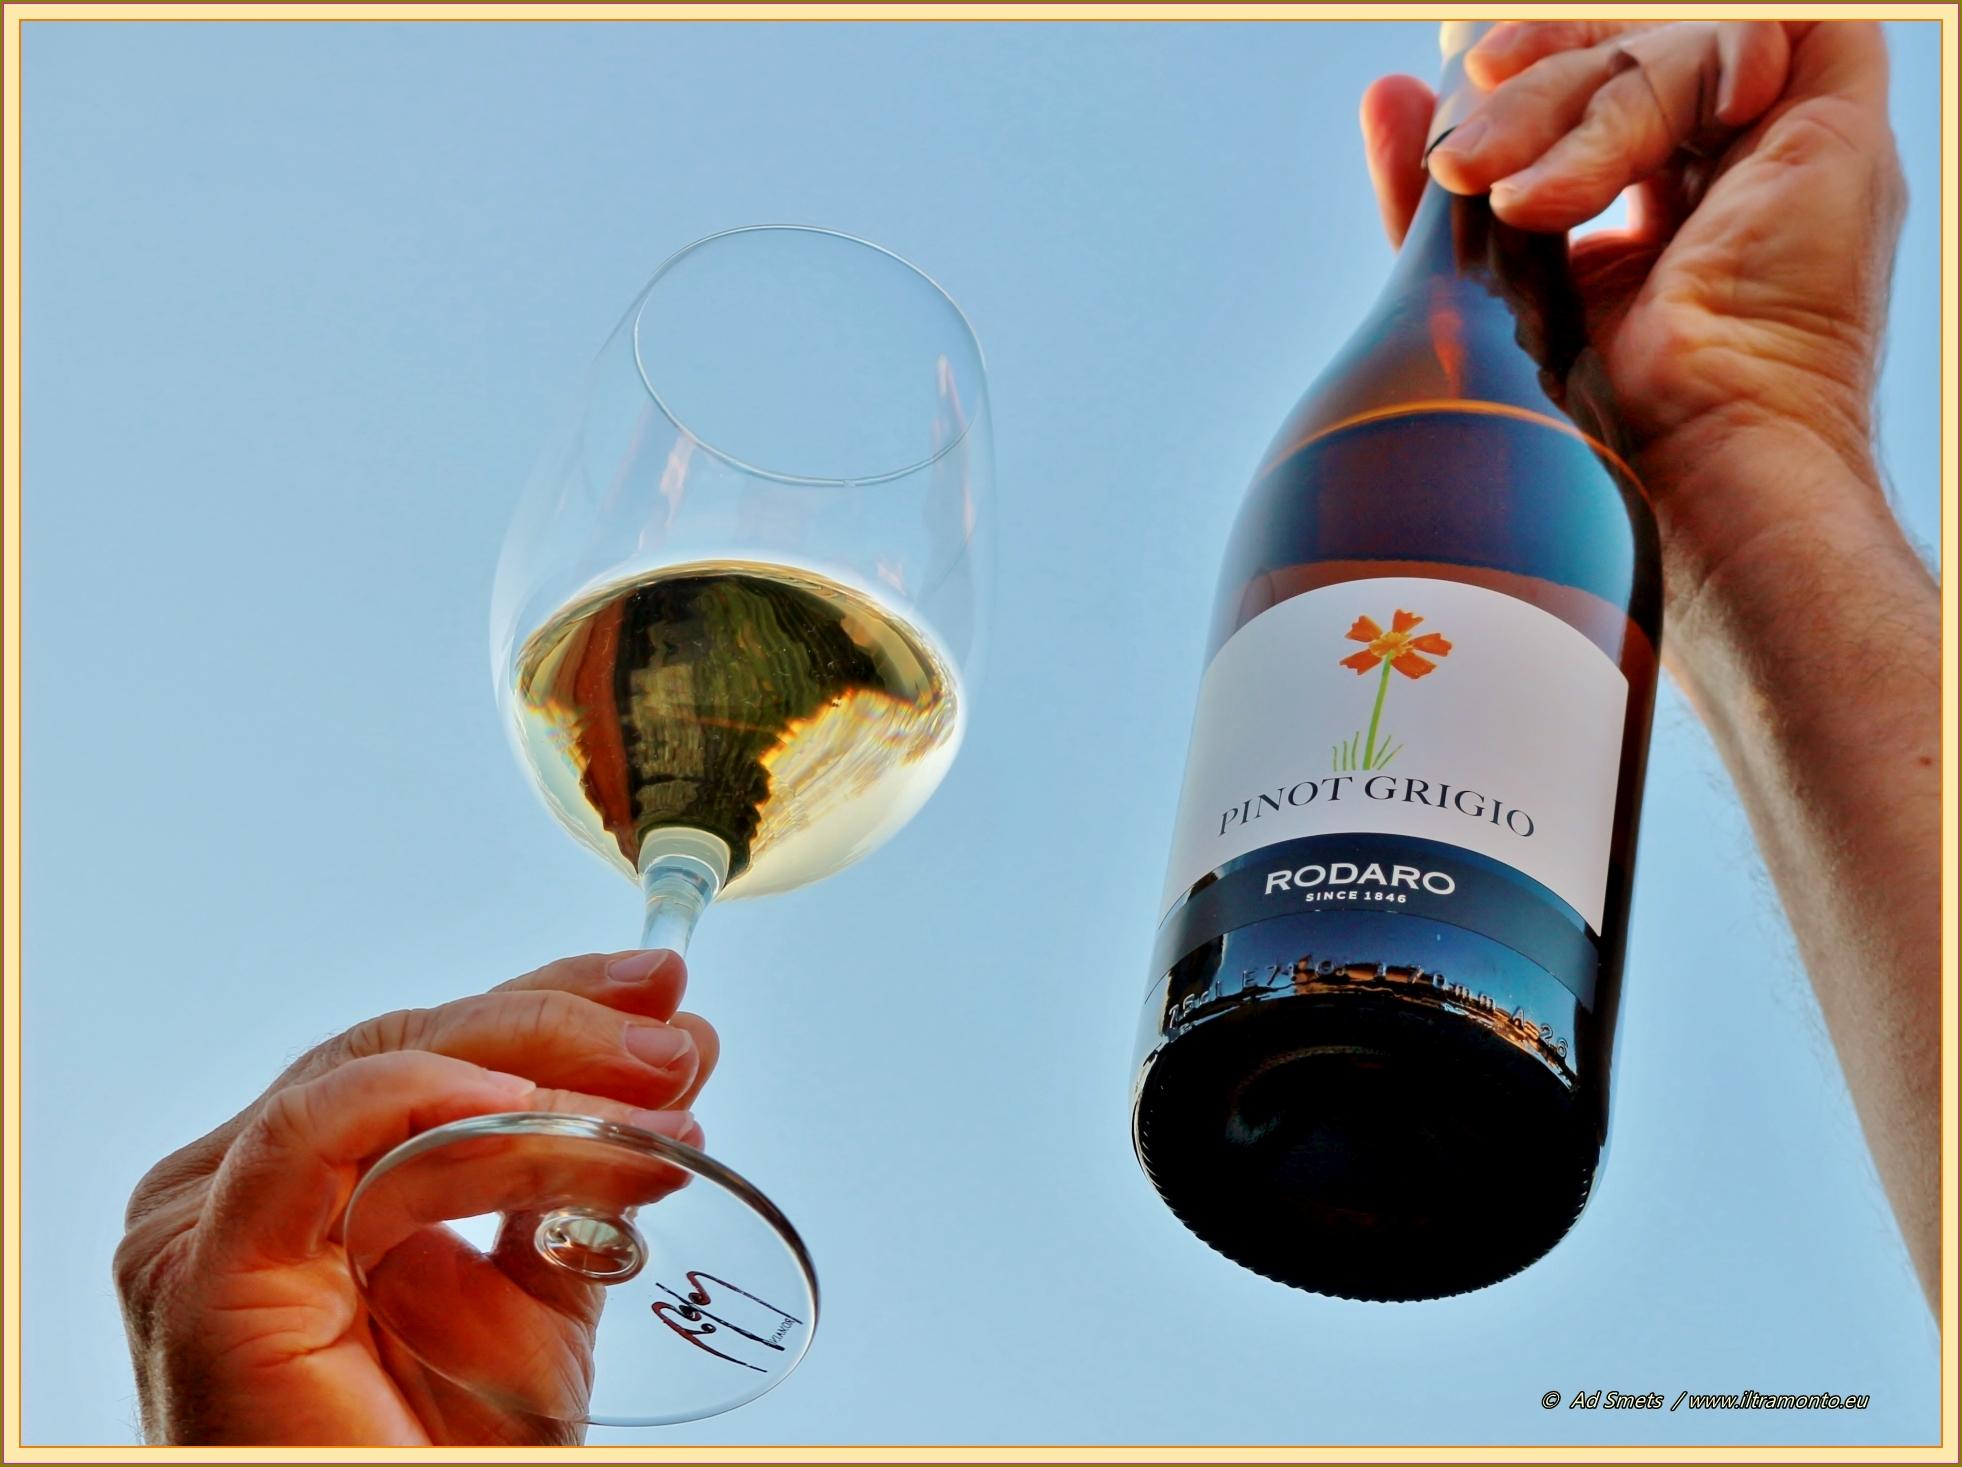 rodaro-pg_0990-il-tramonto-wines